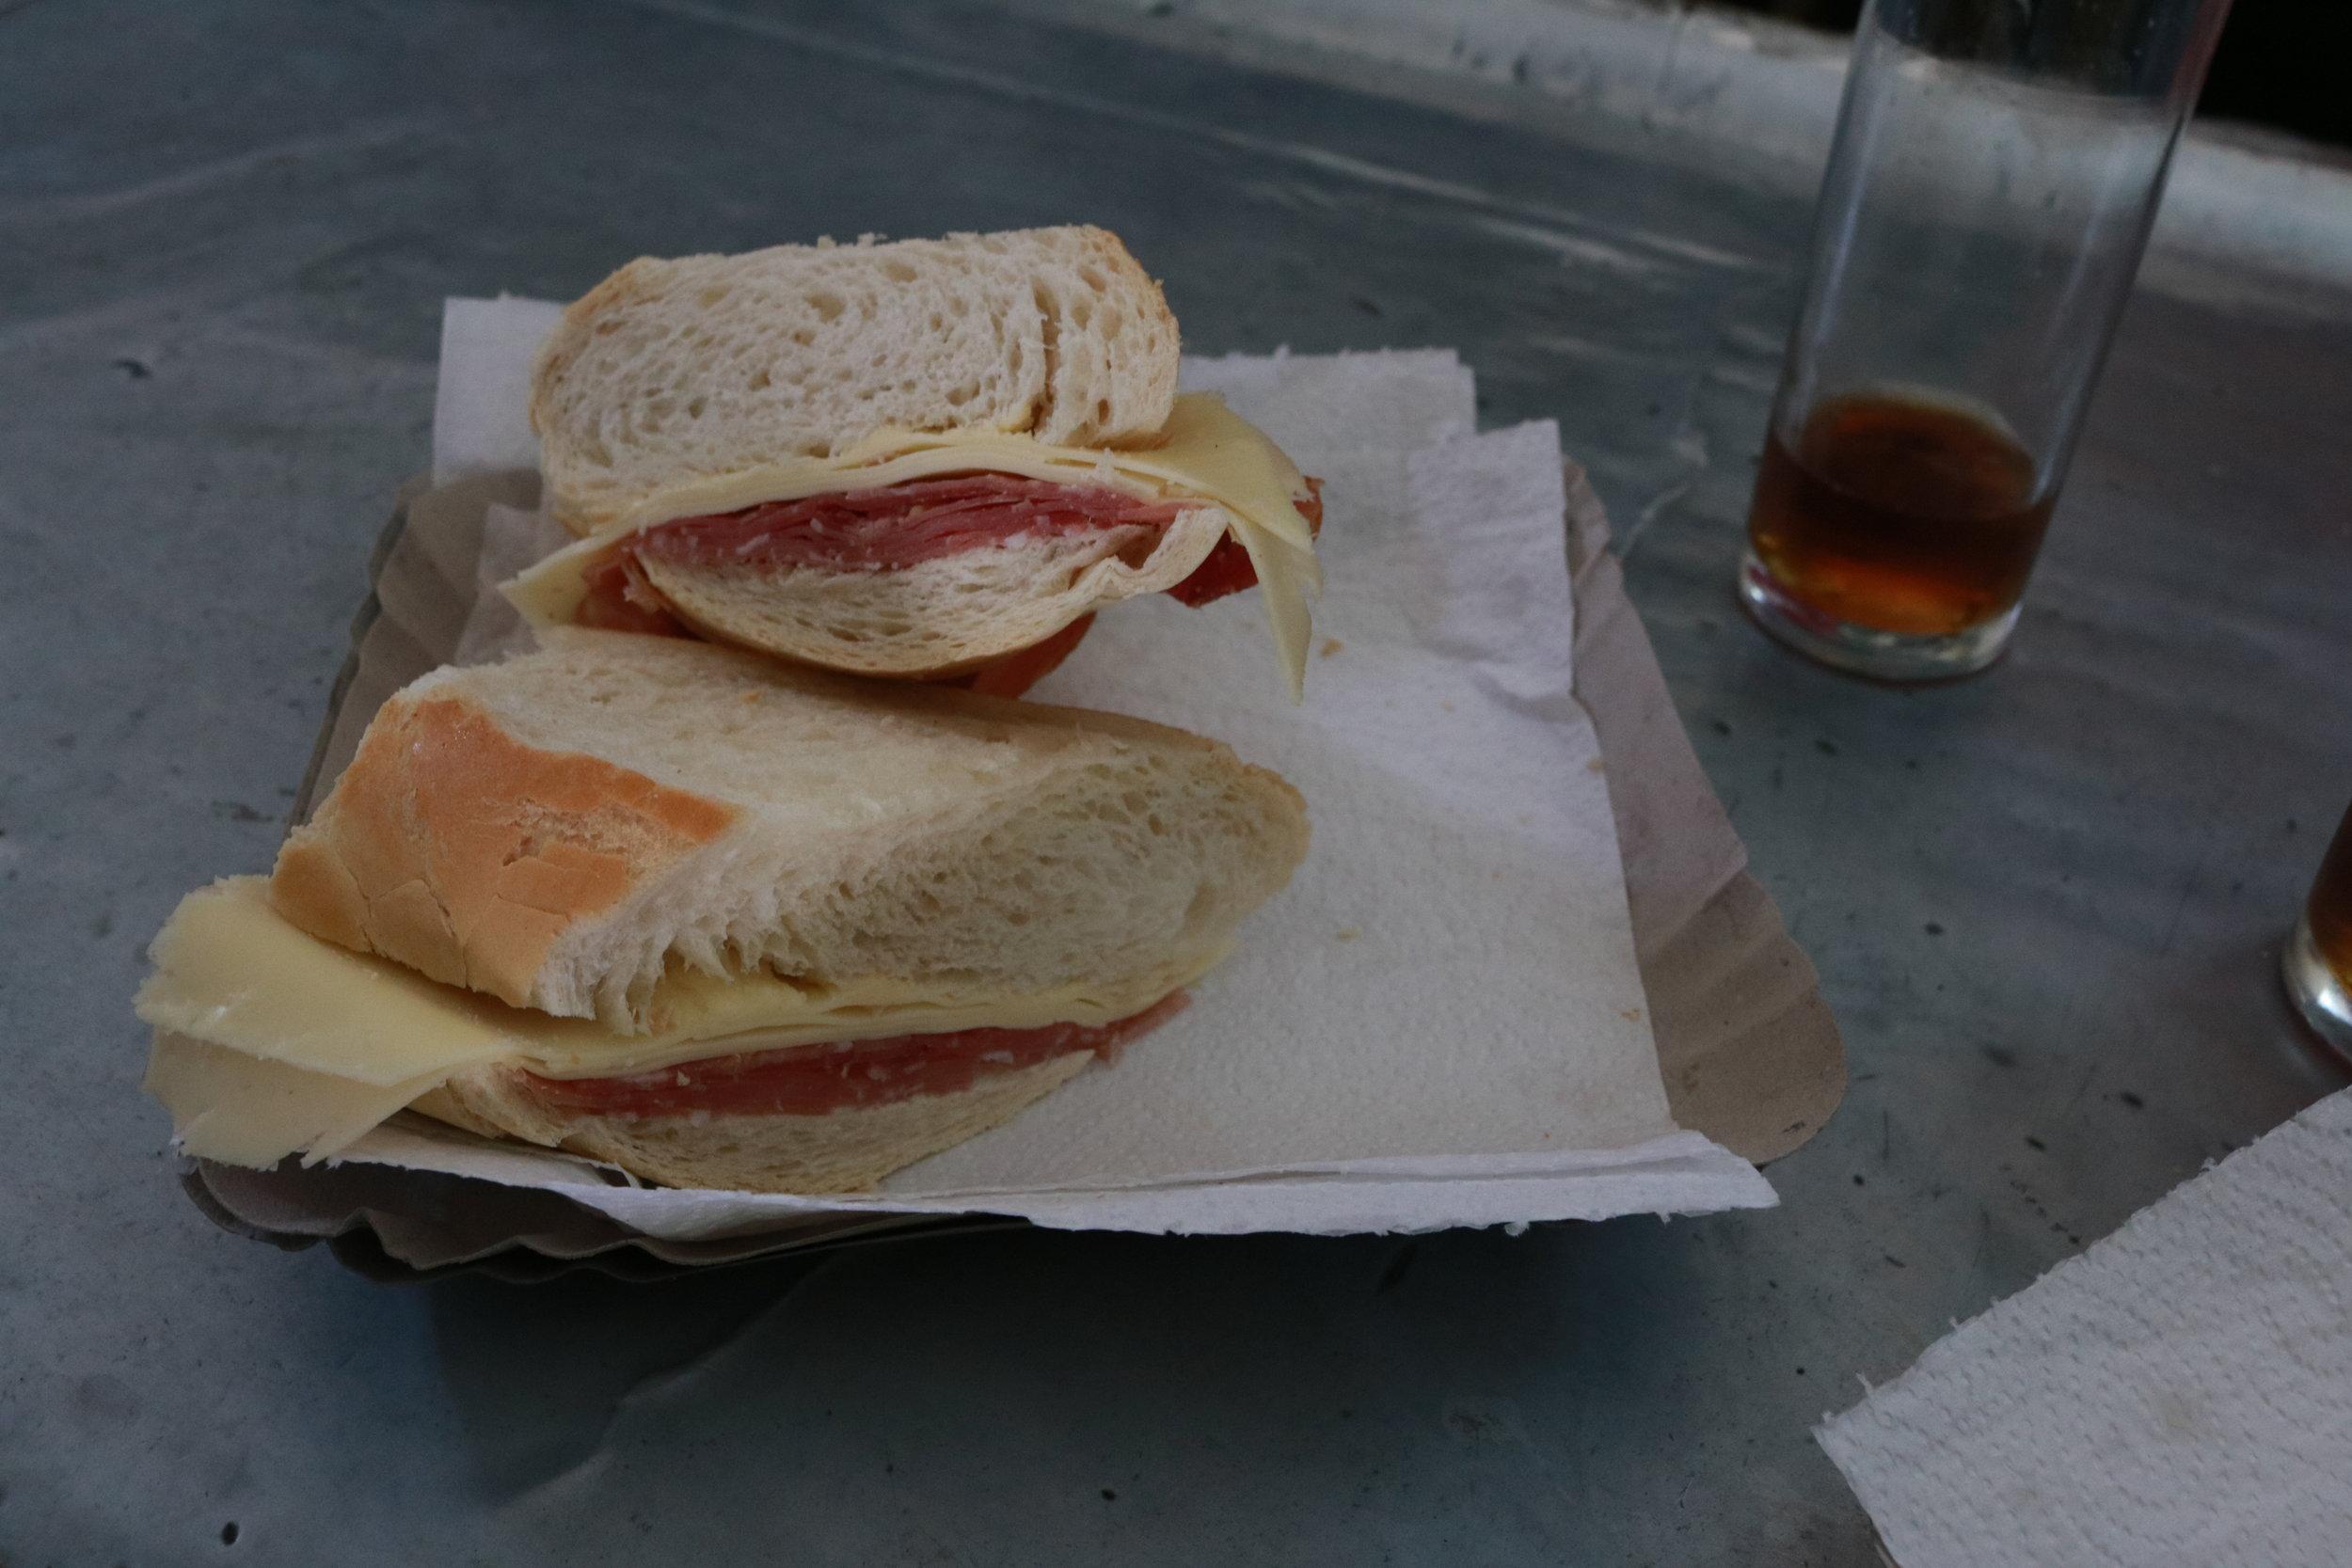 Los Mejores sandwiches de Jamon Crudo de Cordoba